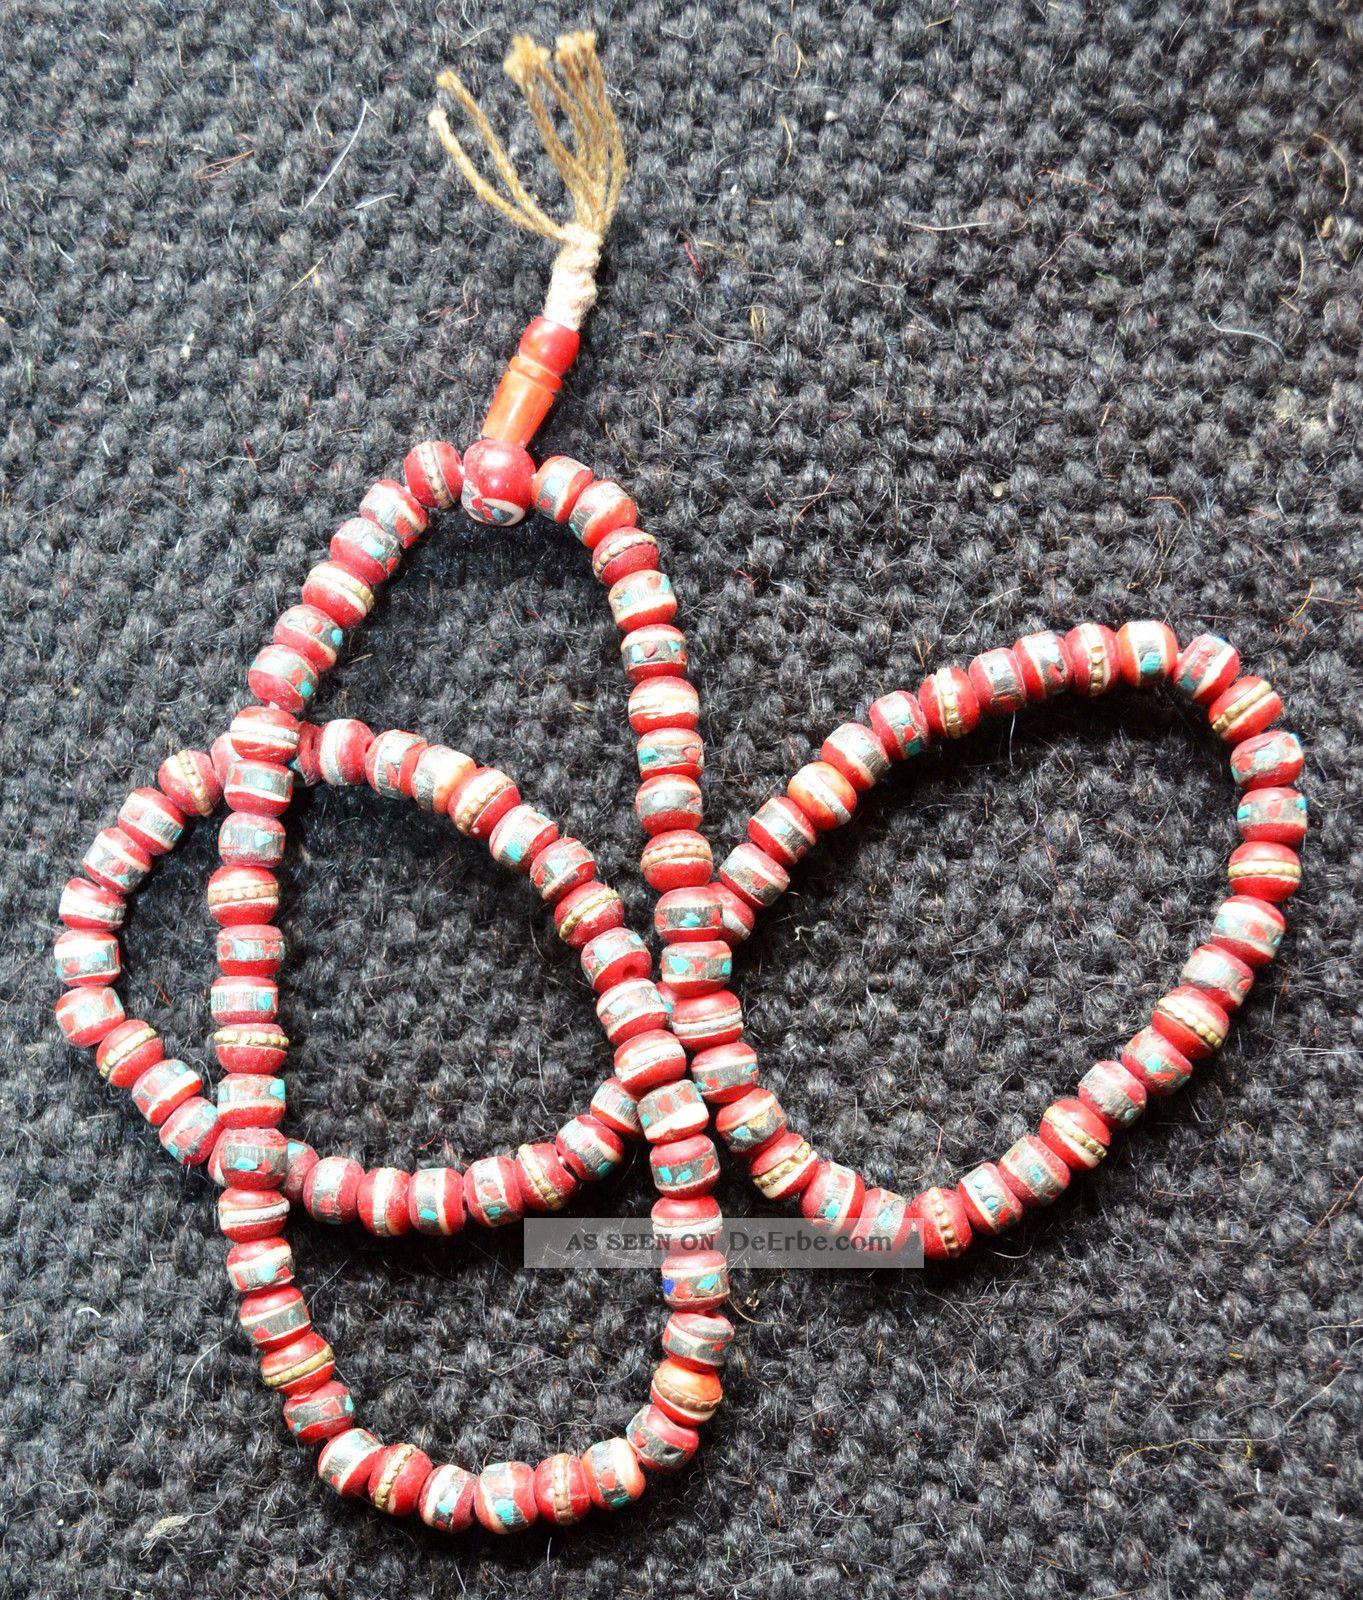 Tibet Mala Prayerbeads Gebetskette Knochen Bone Korallen